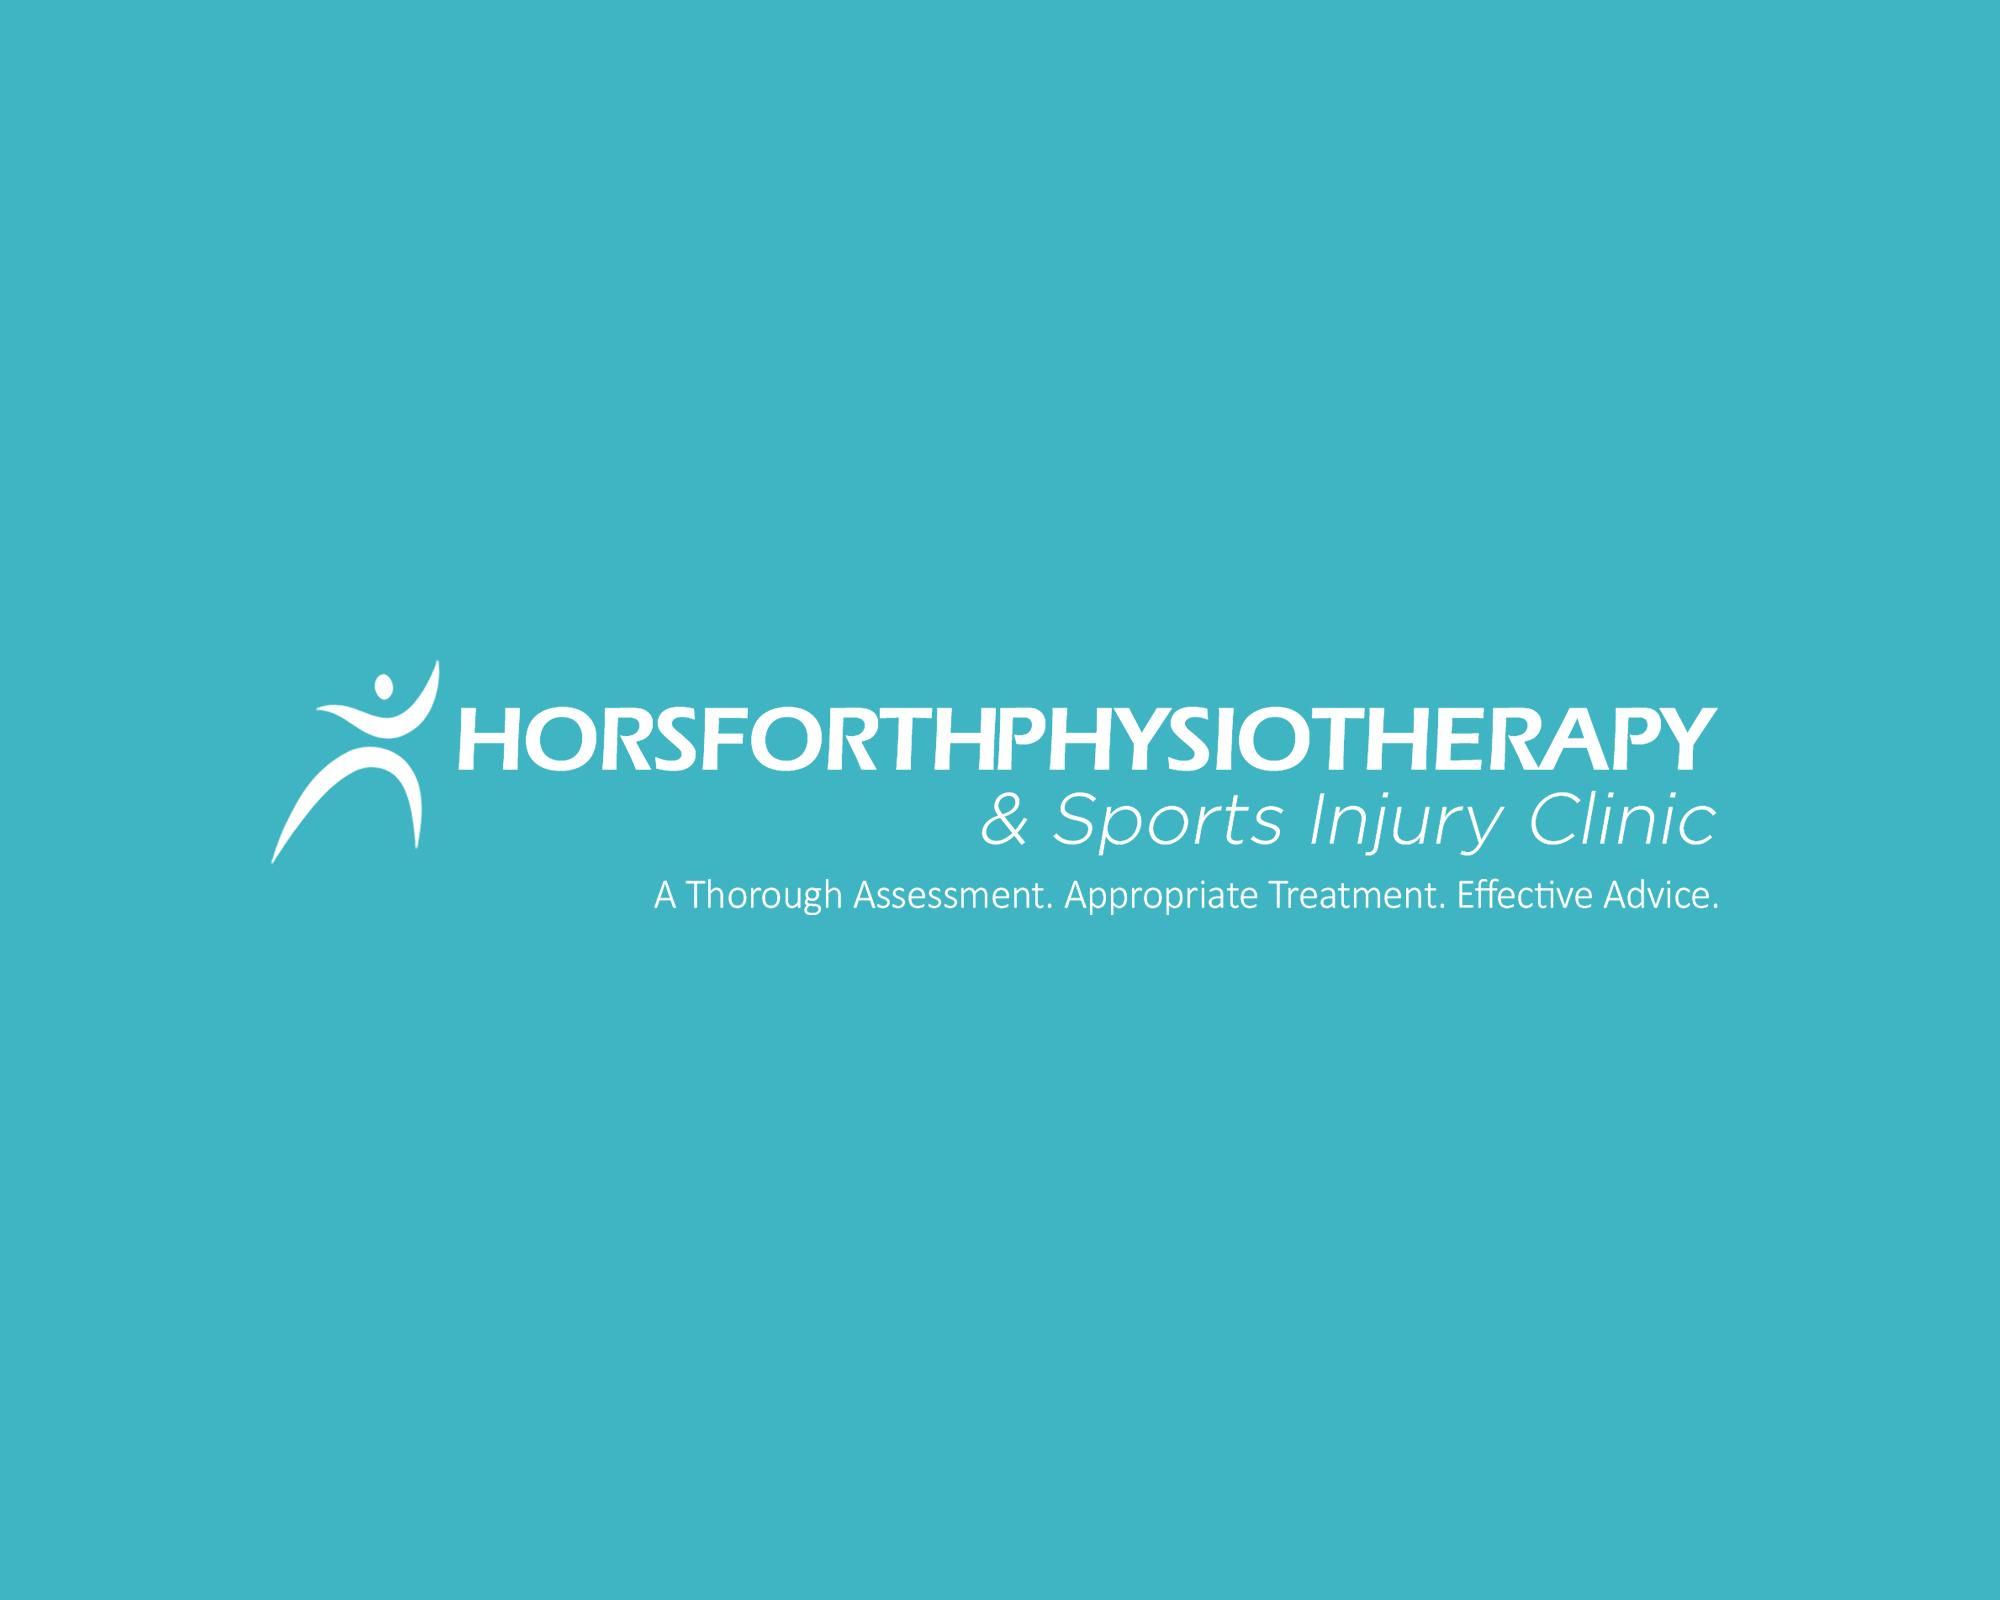 horsforth physiotherapy Logo